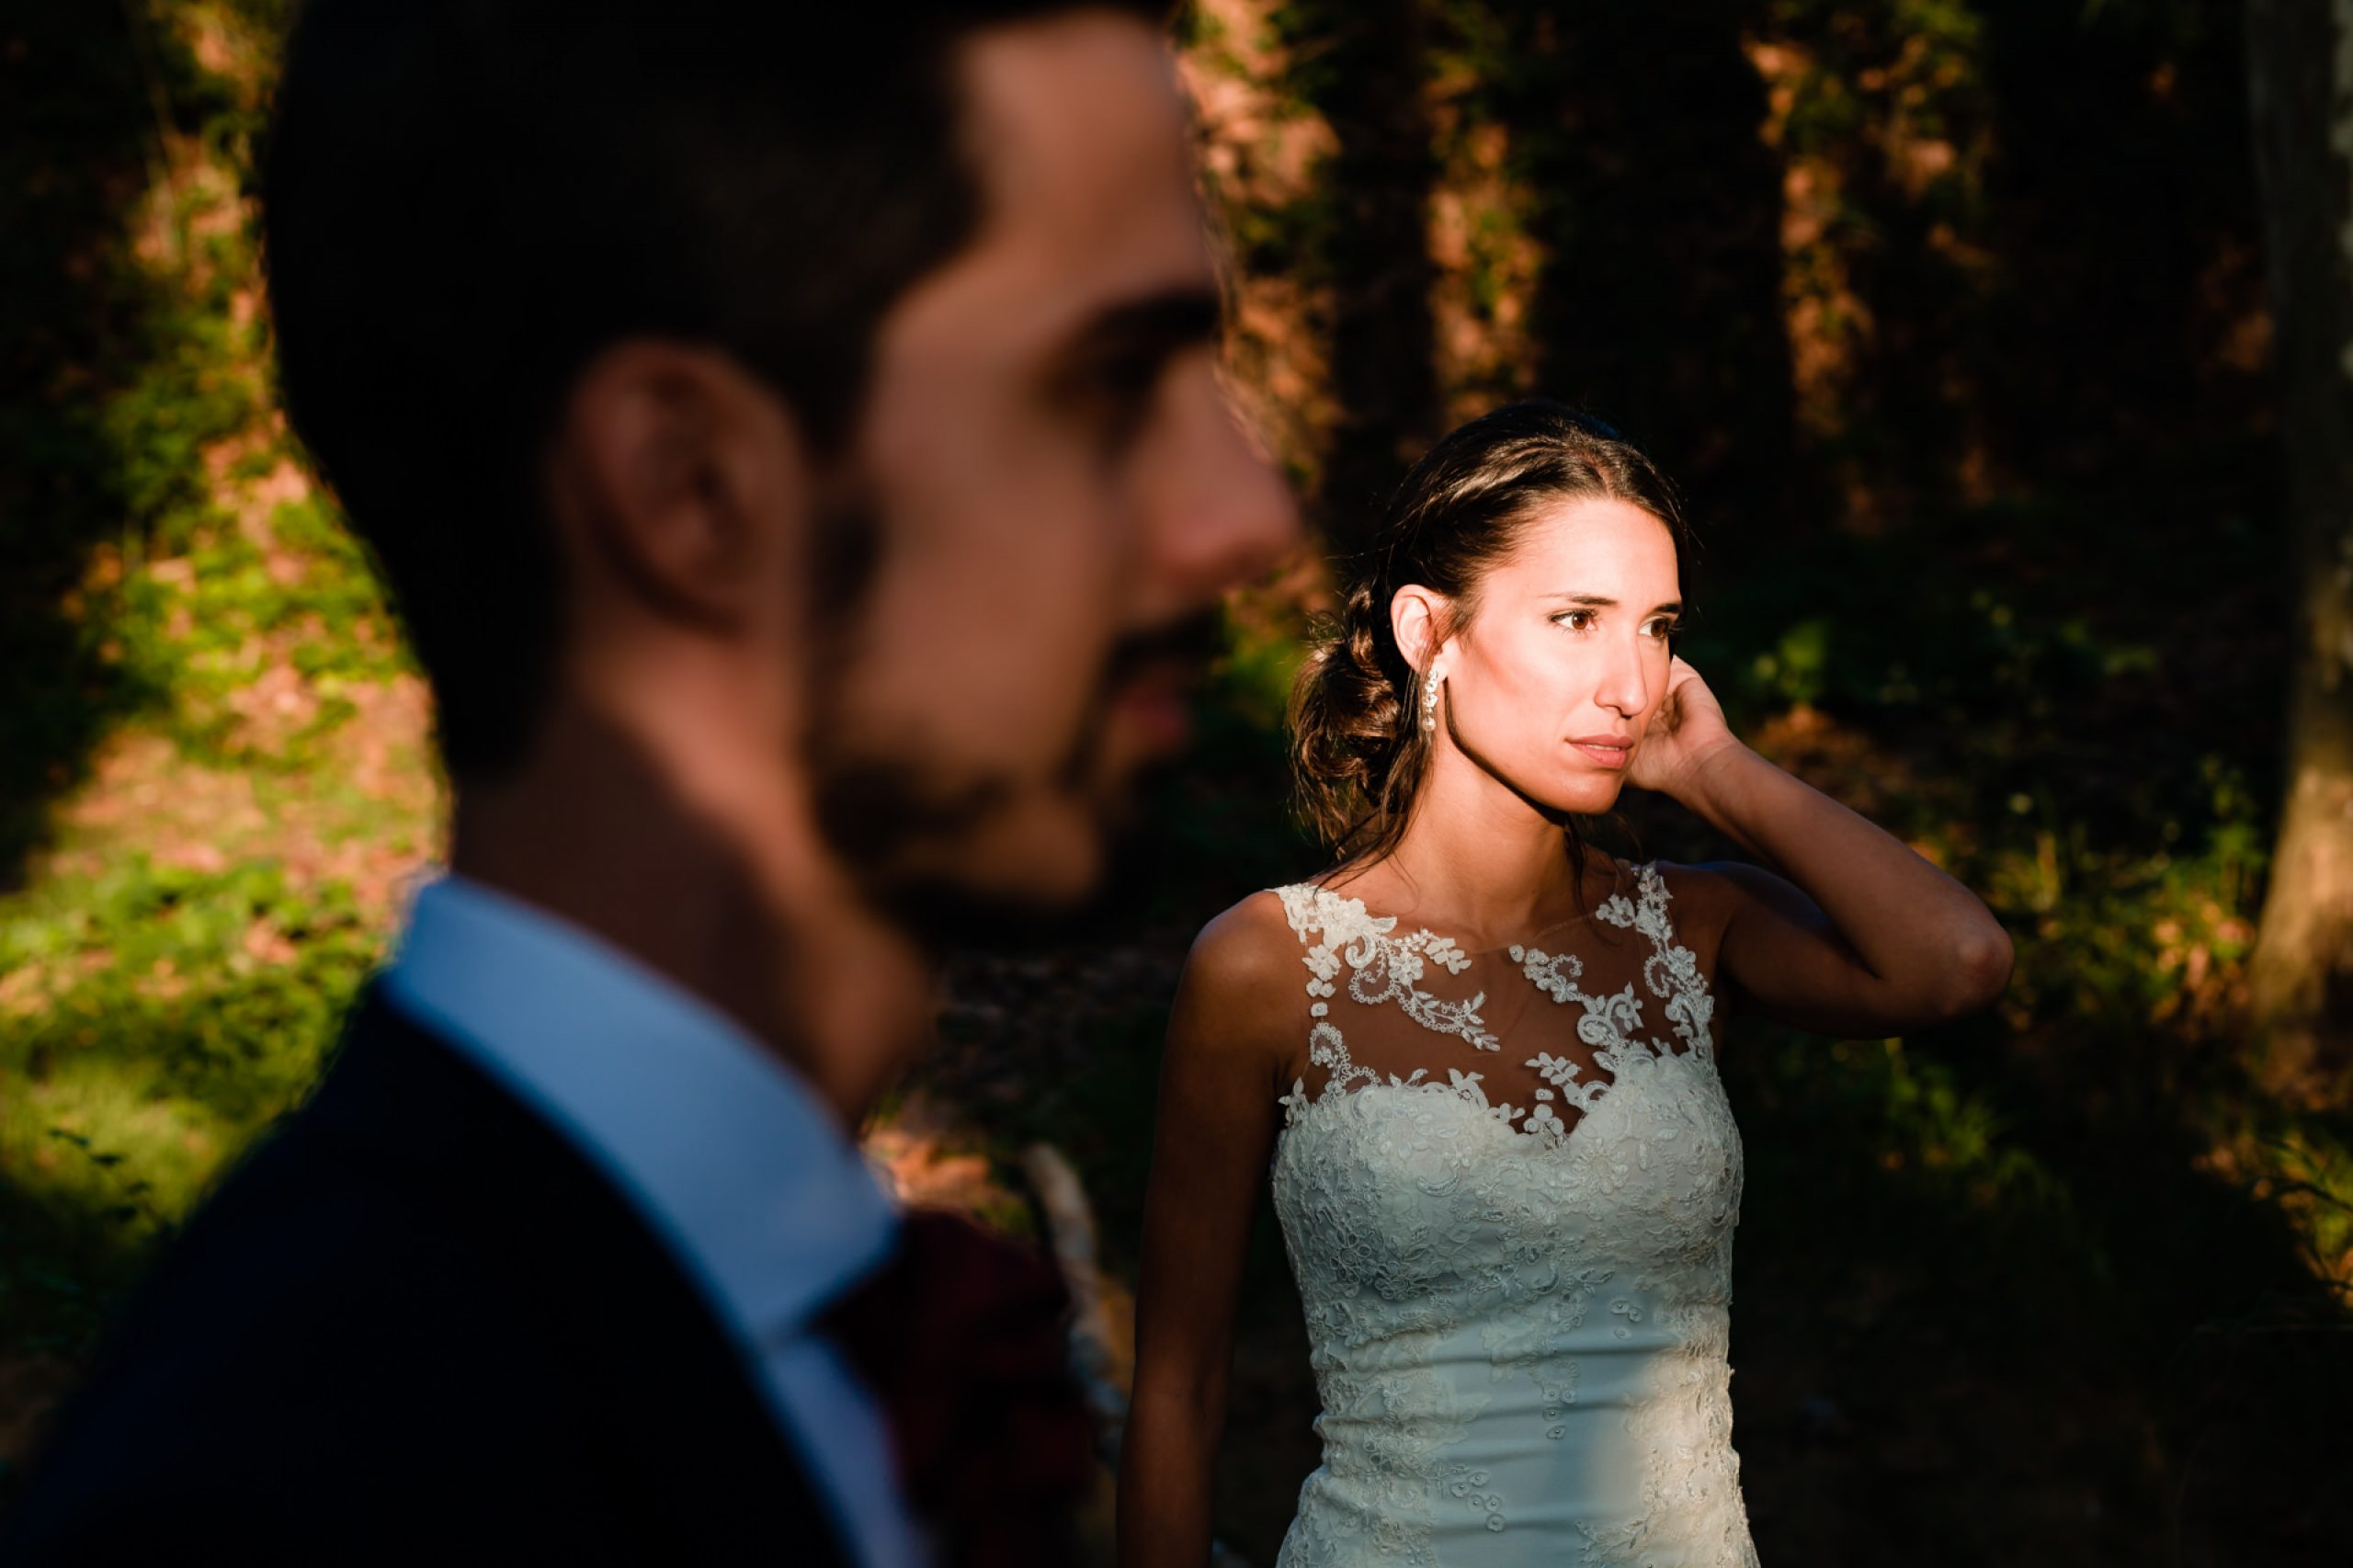 LuzdeBarcelona-postboda-boda-fotografo-cerdanyola-38